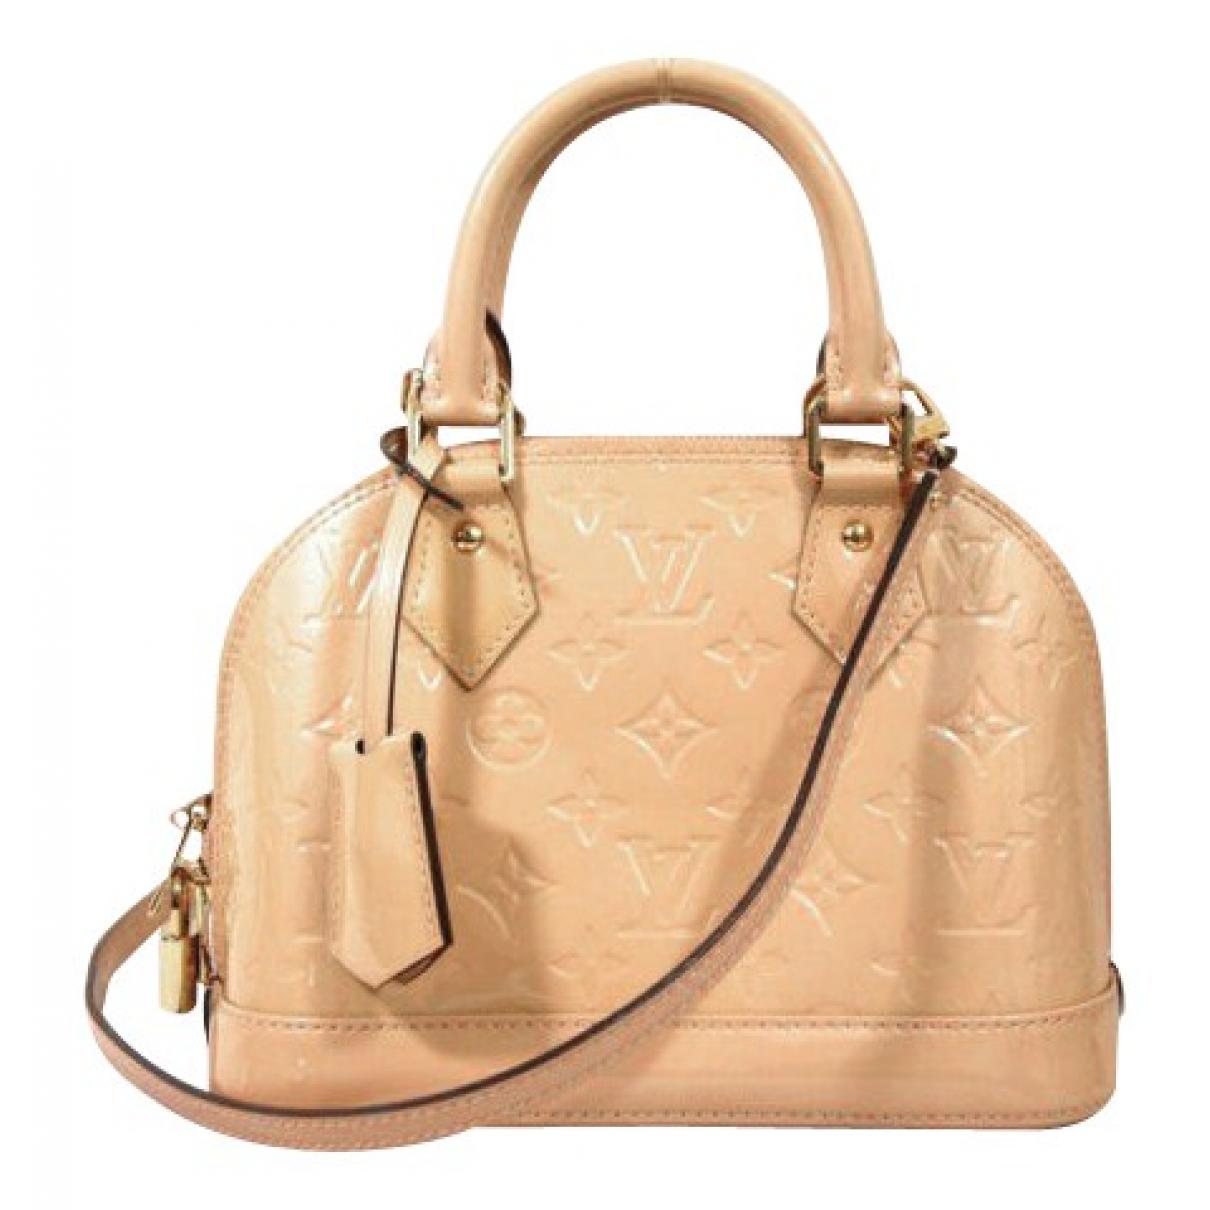 Louis Vuitton - Sac a main Alma BB pour femme en cuir verni - beige